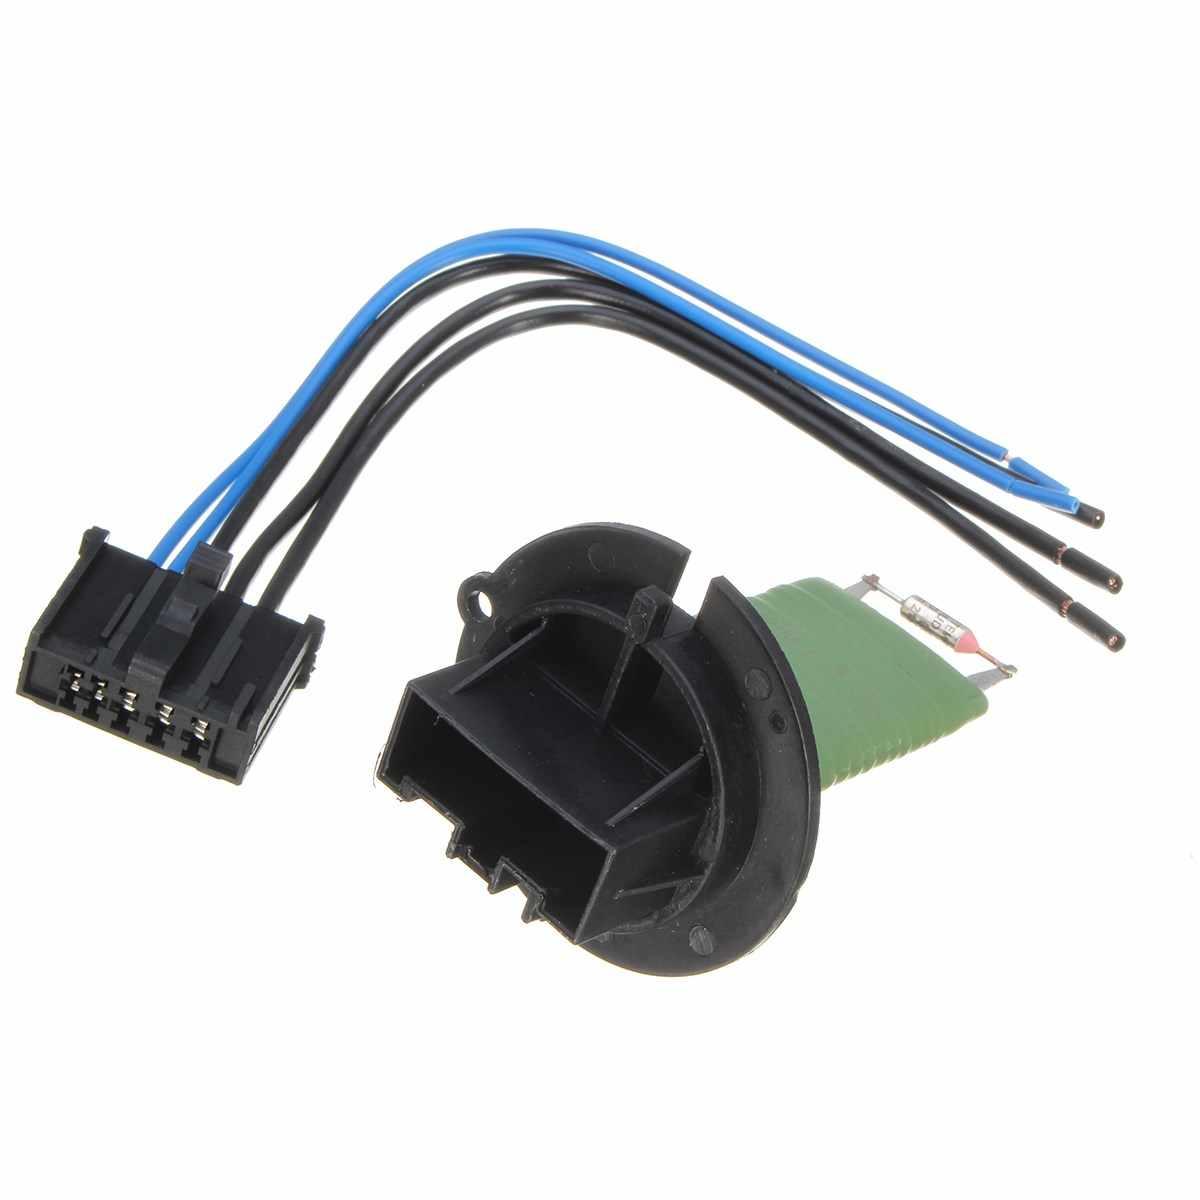 heater motor resistor connector wiring harness for peugeot 206 307 for citroen c3 [ 1200 x 1200 Pixel ]